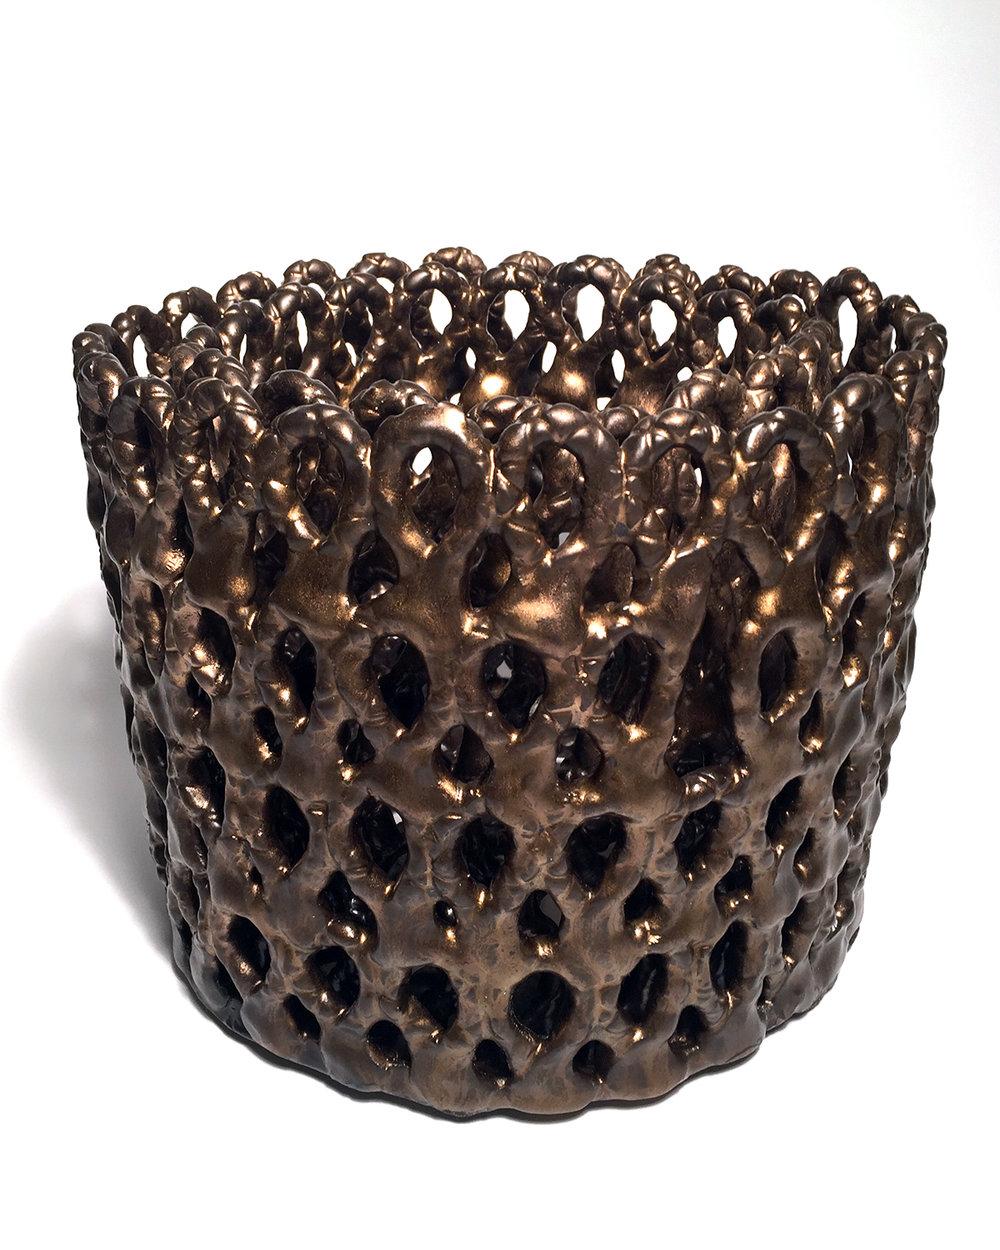 BronzeBucket4.jpg